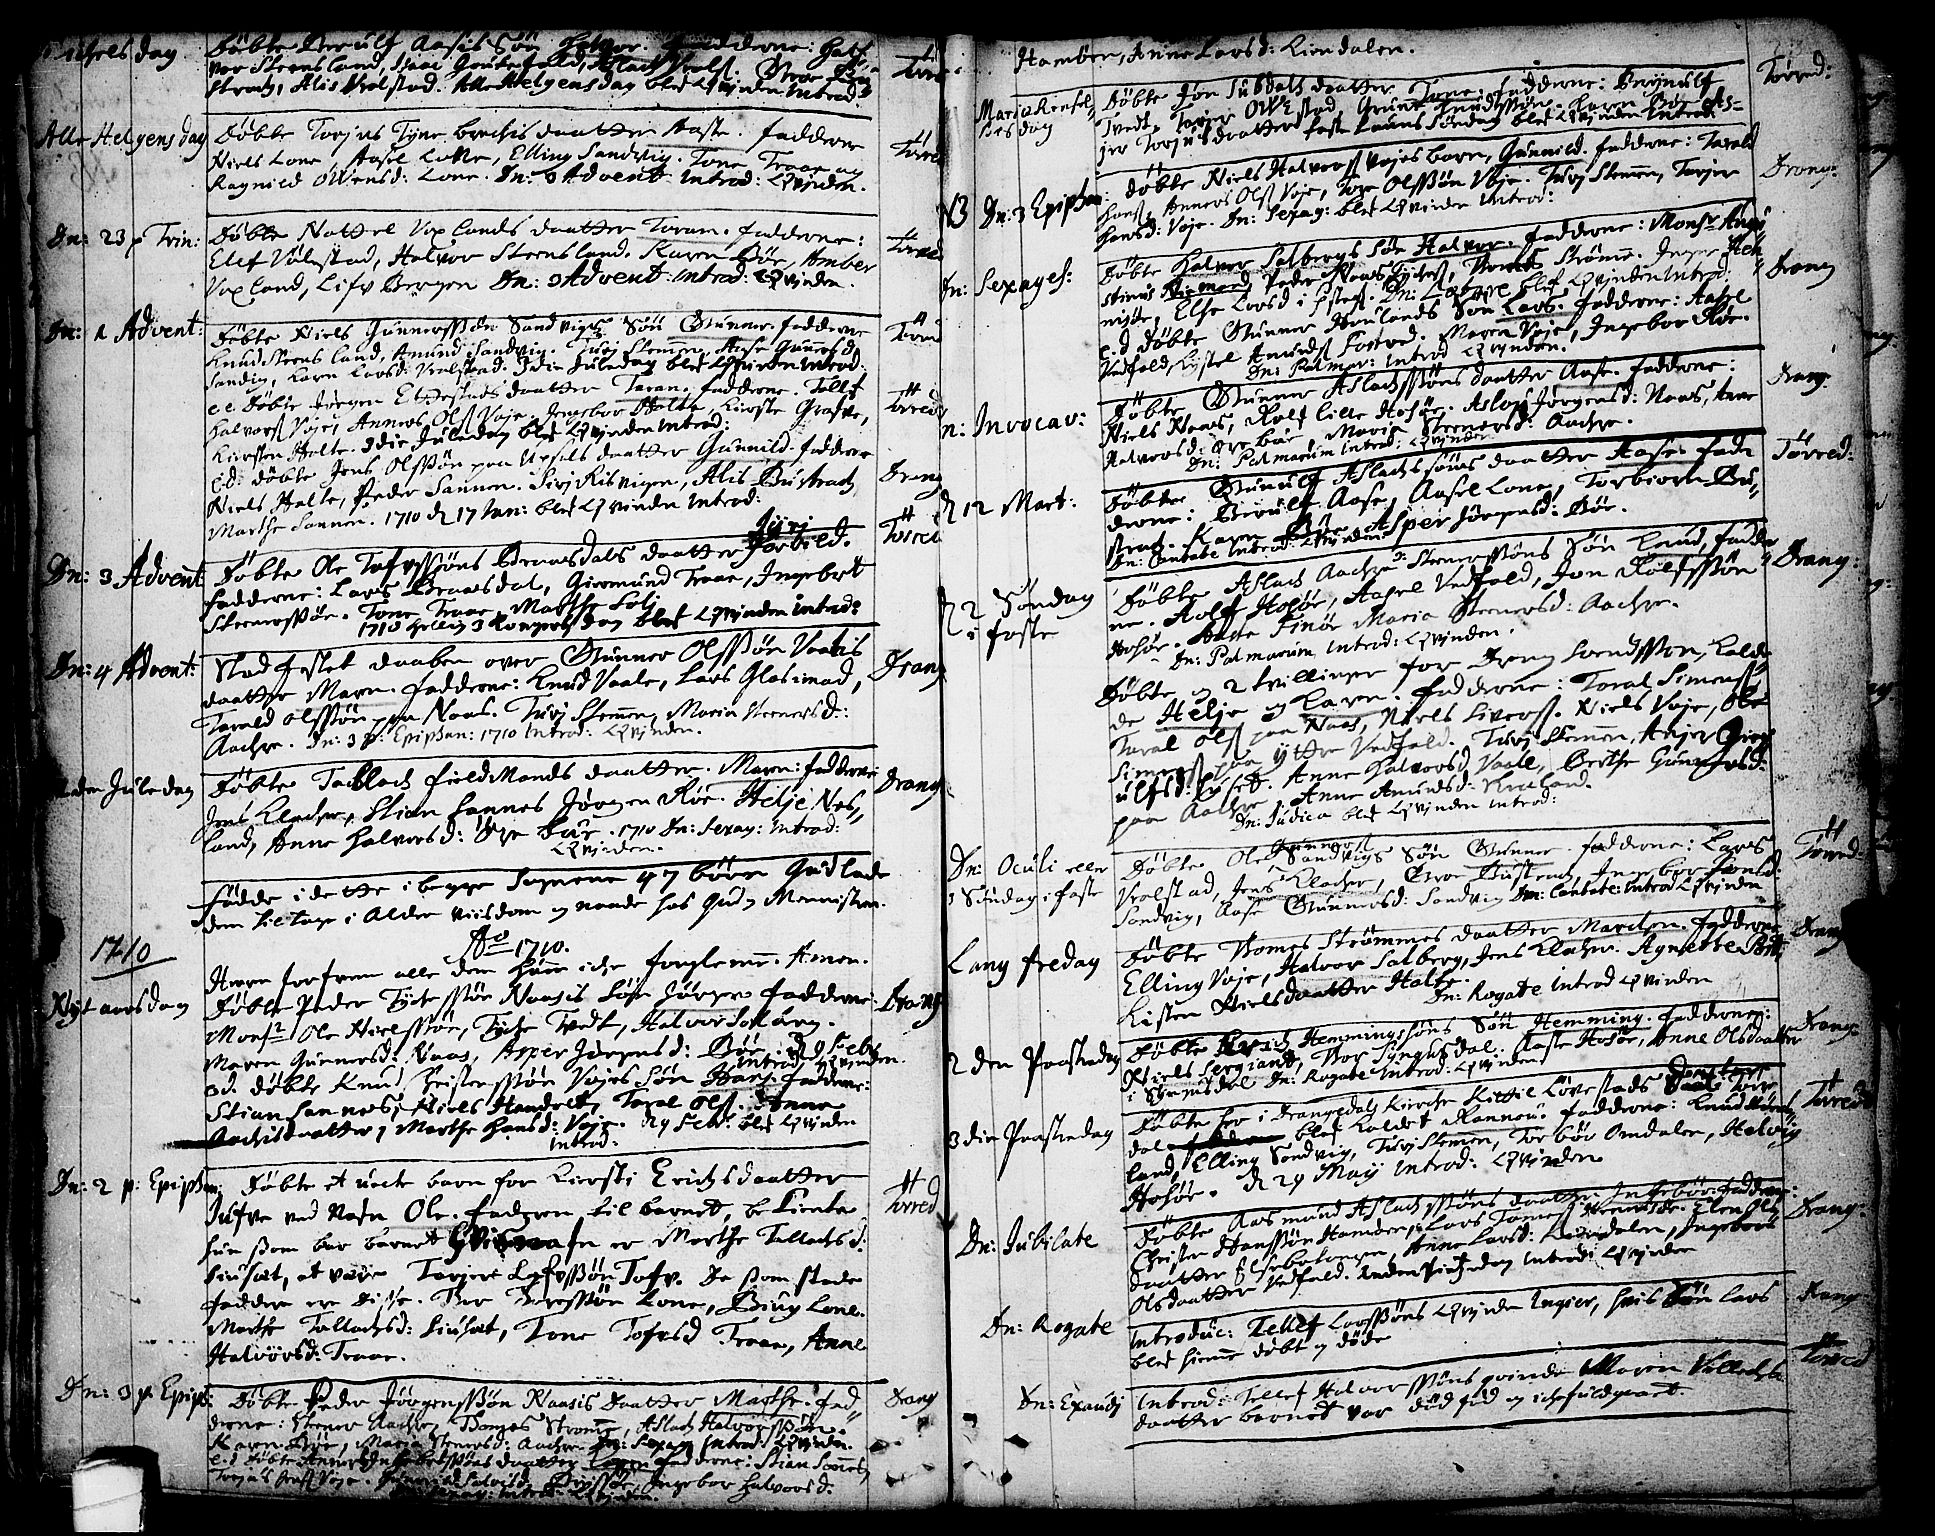 SAKO, Drangedal kirkebøker, F/Fa/L0001: Ministerialbok nr. 1, 1697-1767, s. 23